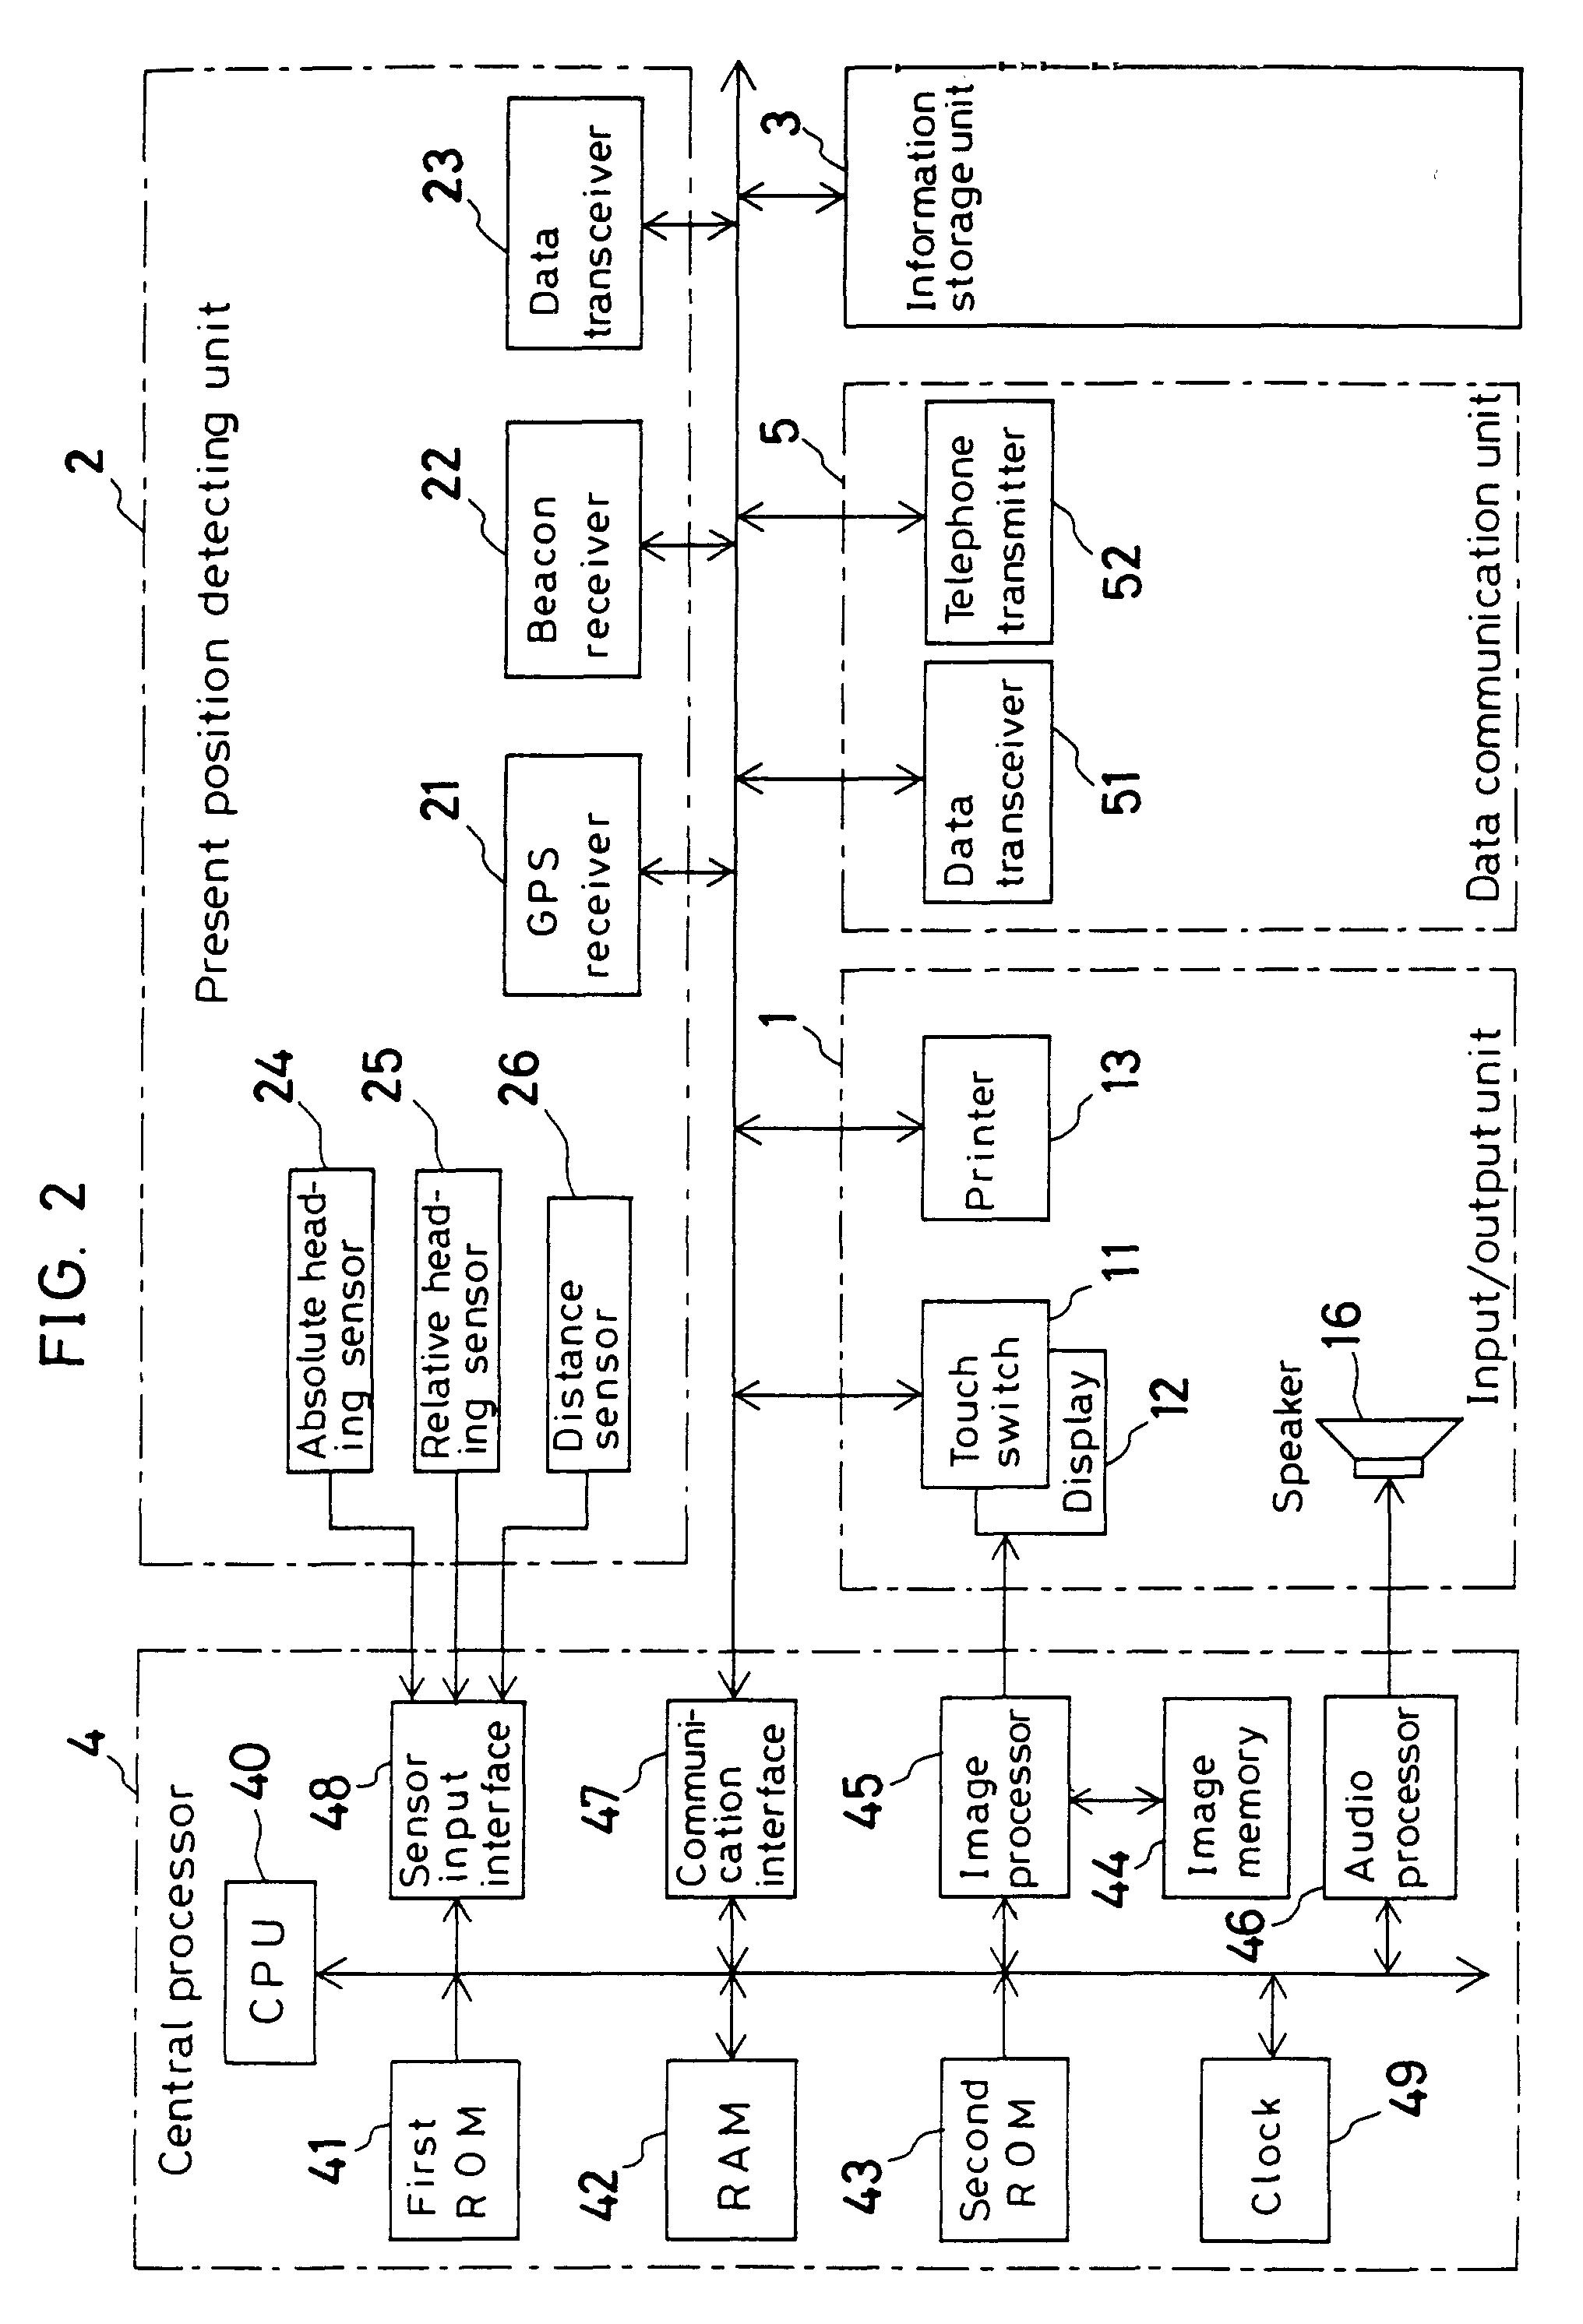 patent ep0699894b1 navigationssystem google patentsuche. Black Bedroom Furniture Sets. Home Design Ideas